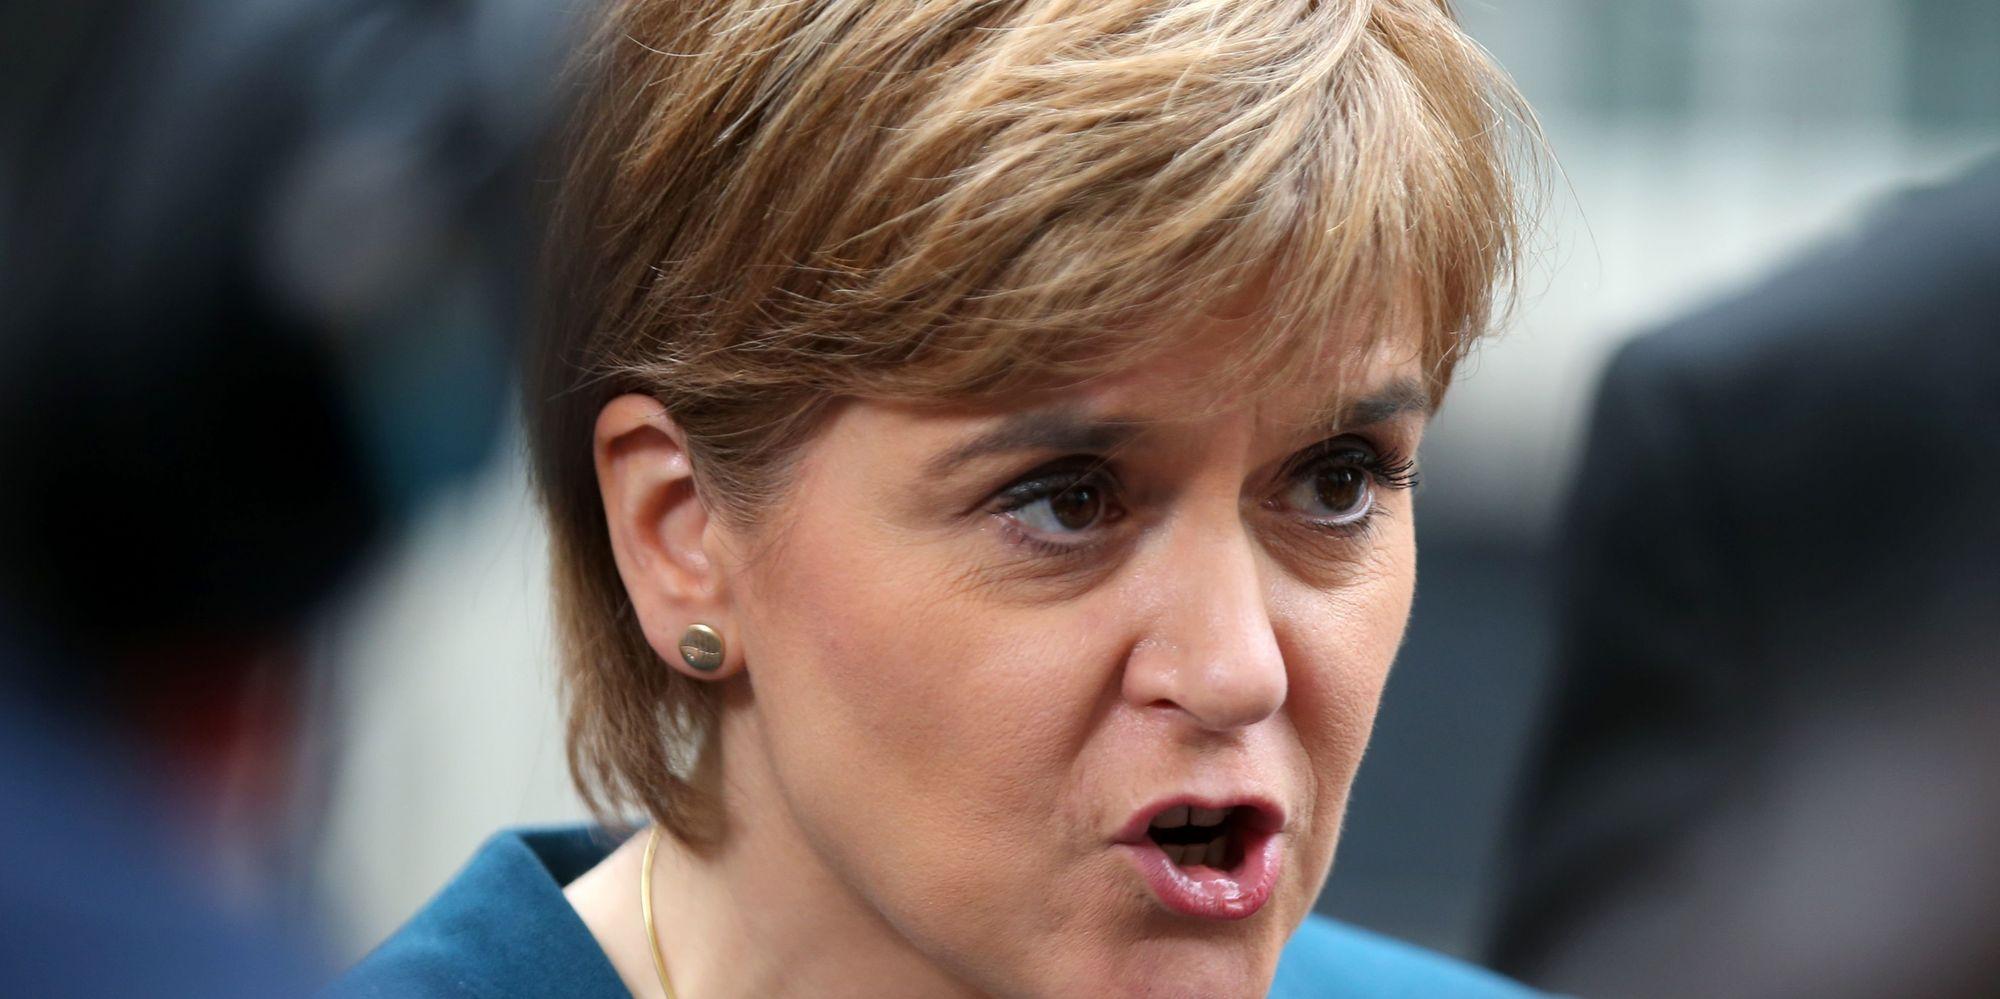 Nicola Sturgeon Hits Back At Sadiq Khan Over 'Spectacularly Ill-Judged' Nationalism Comments